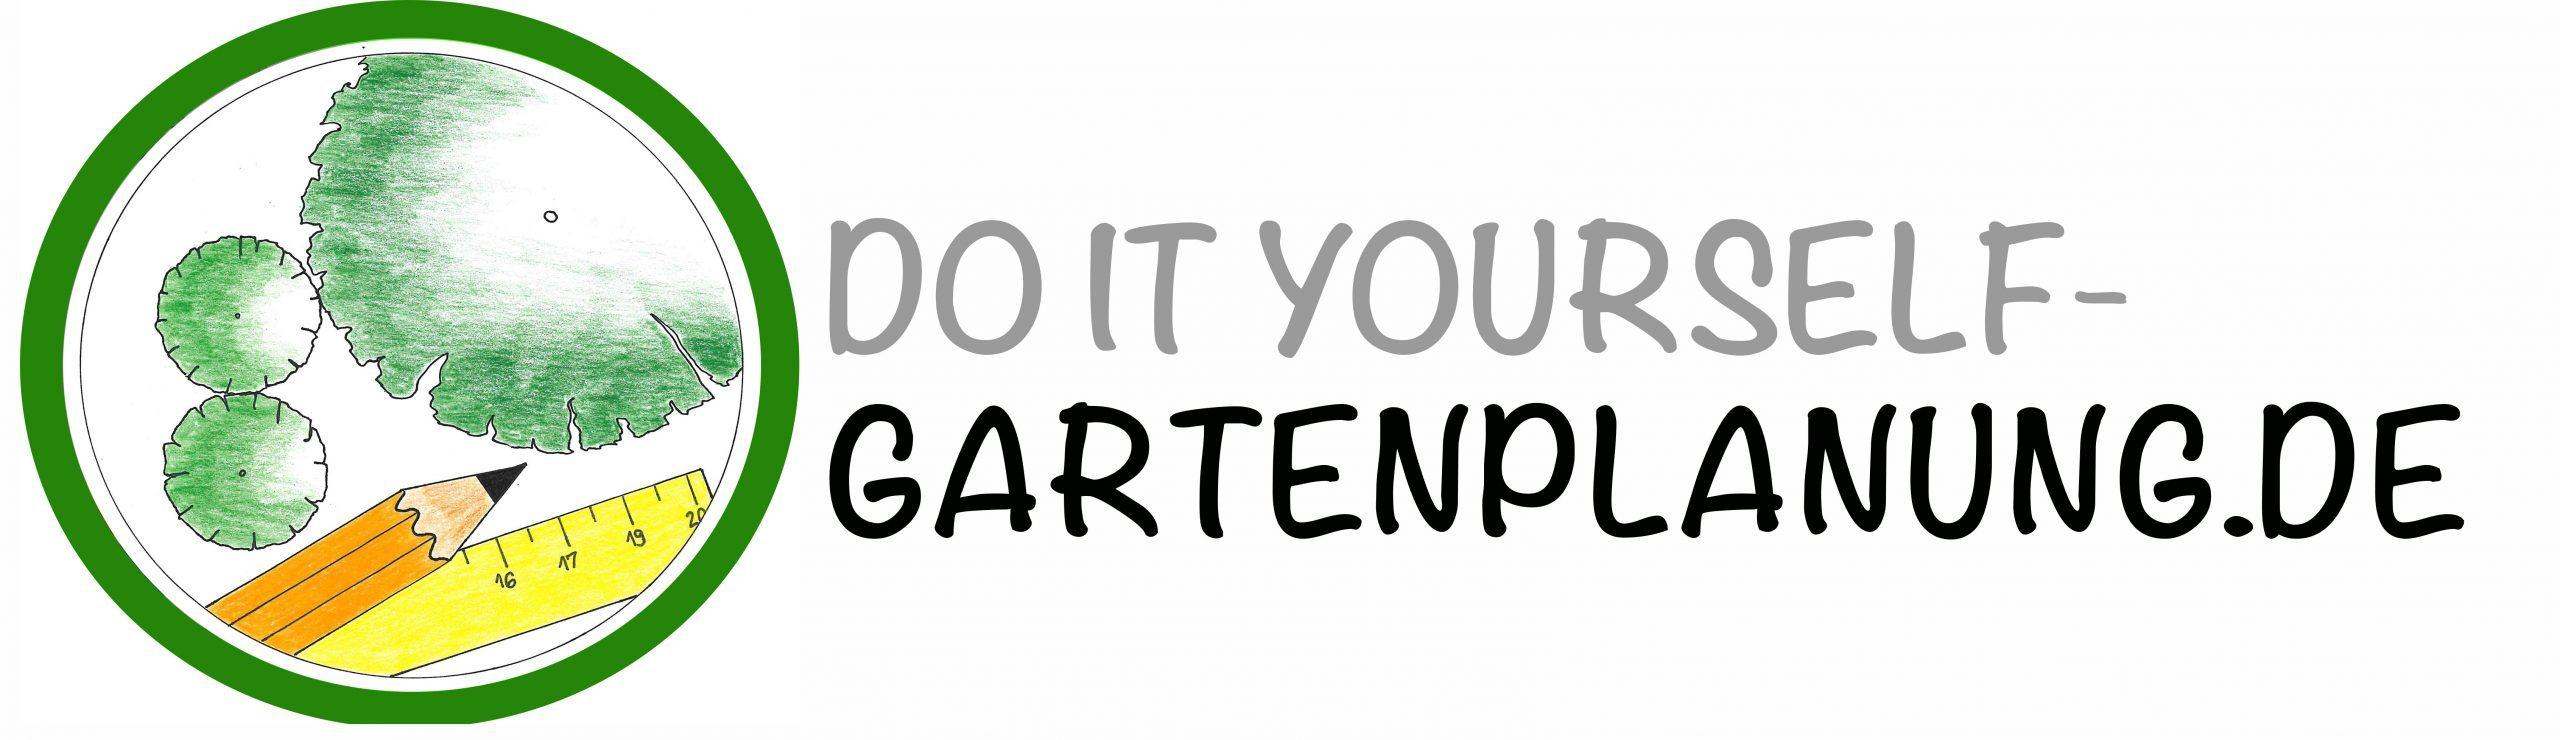 do it yourself-gartenplanung.de